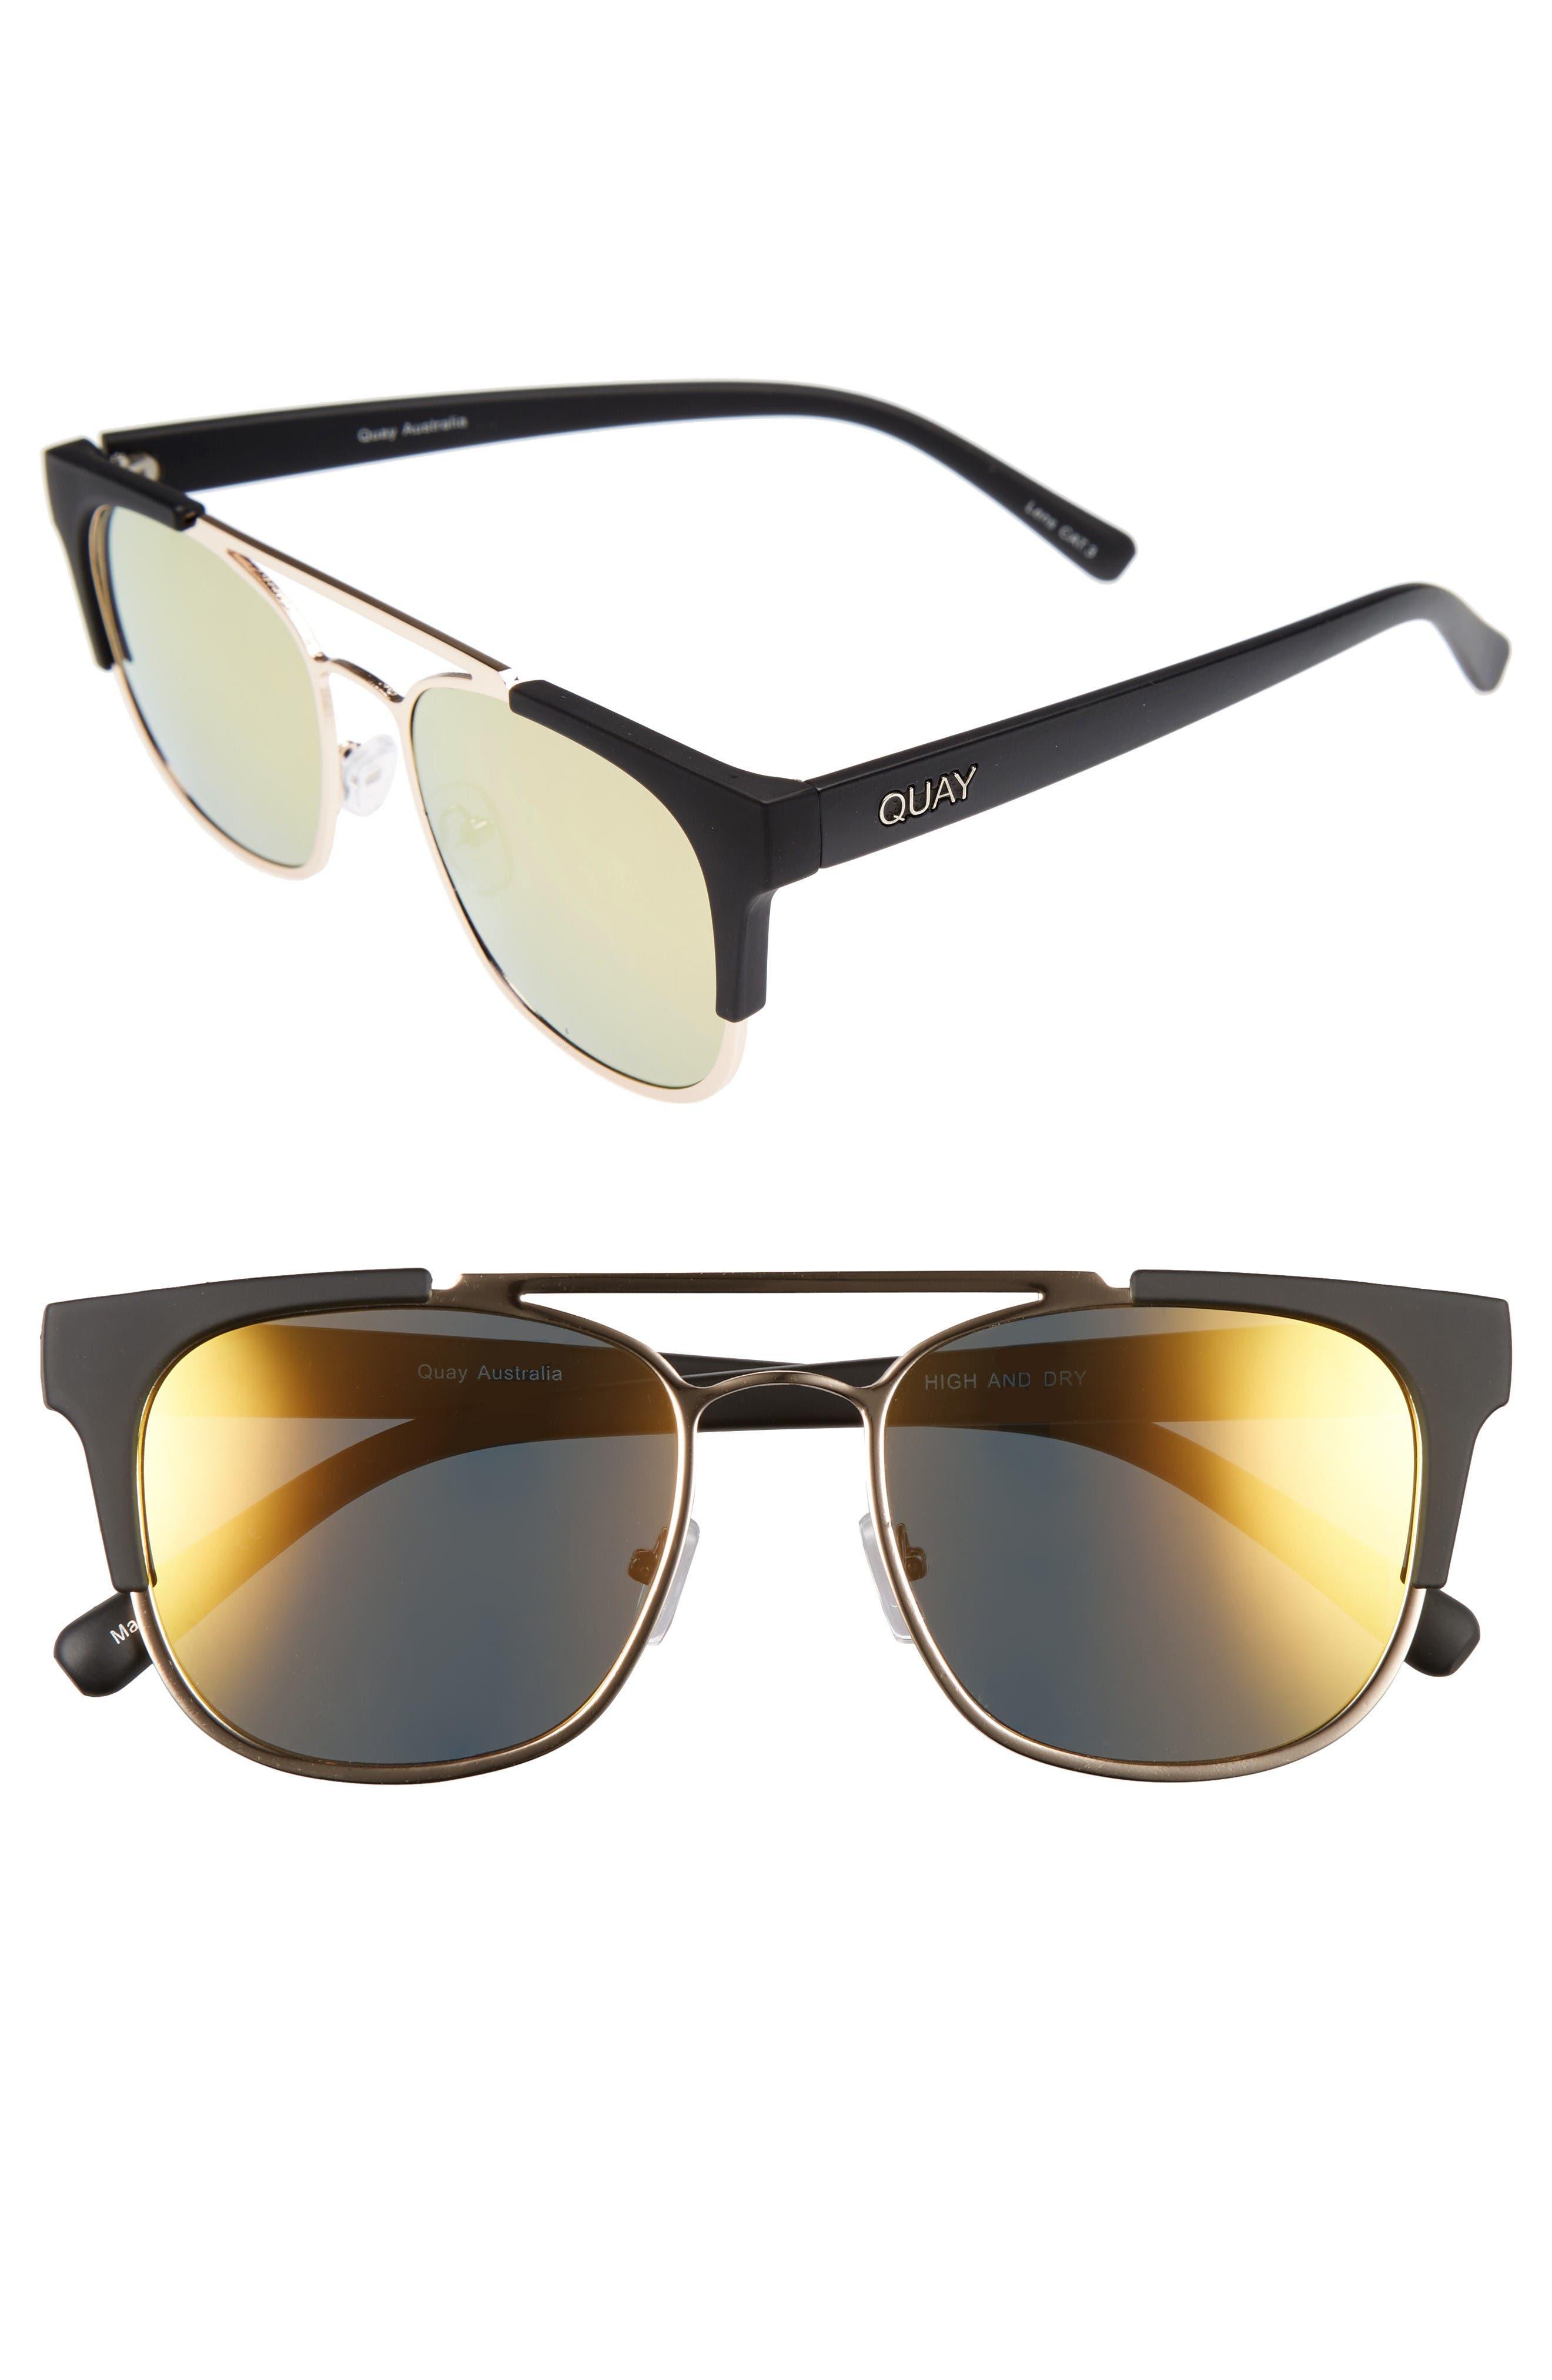 Main Image - Quay Australia High & Dry 53mm Mirrored Sunglasses